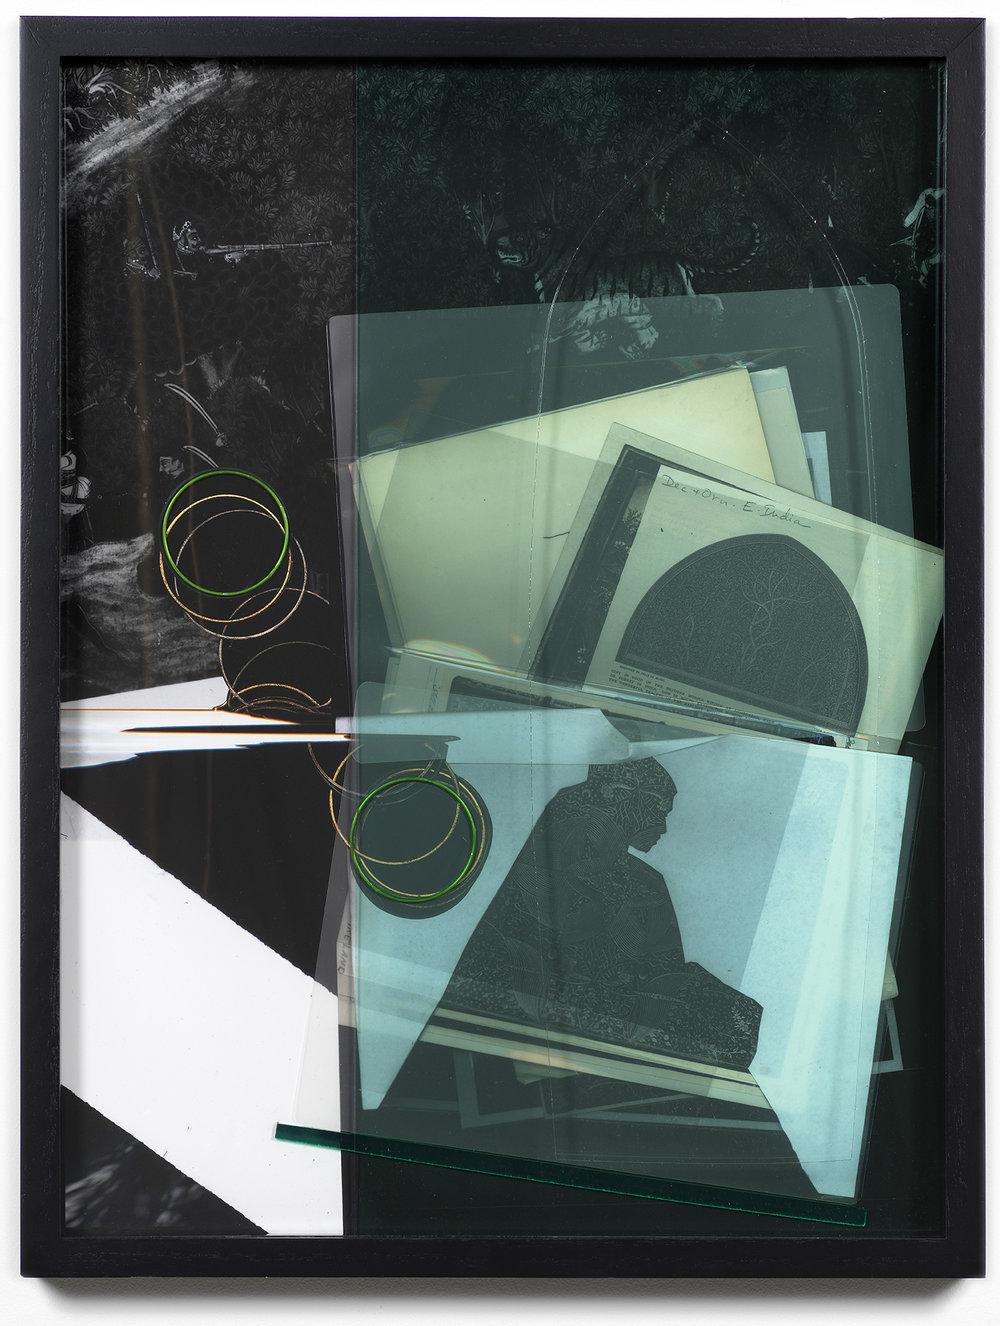 Purity , 2018, chromogenic print, acrylic, 24 x 18 inches